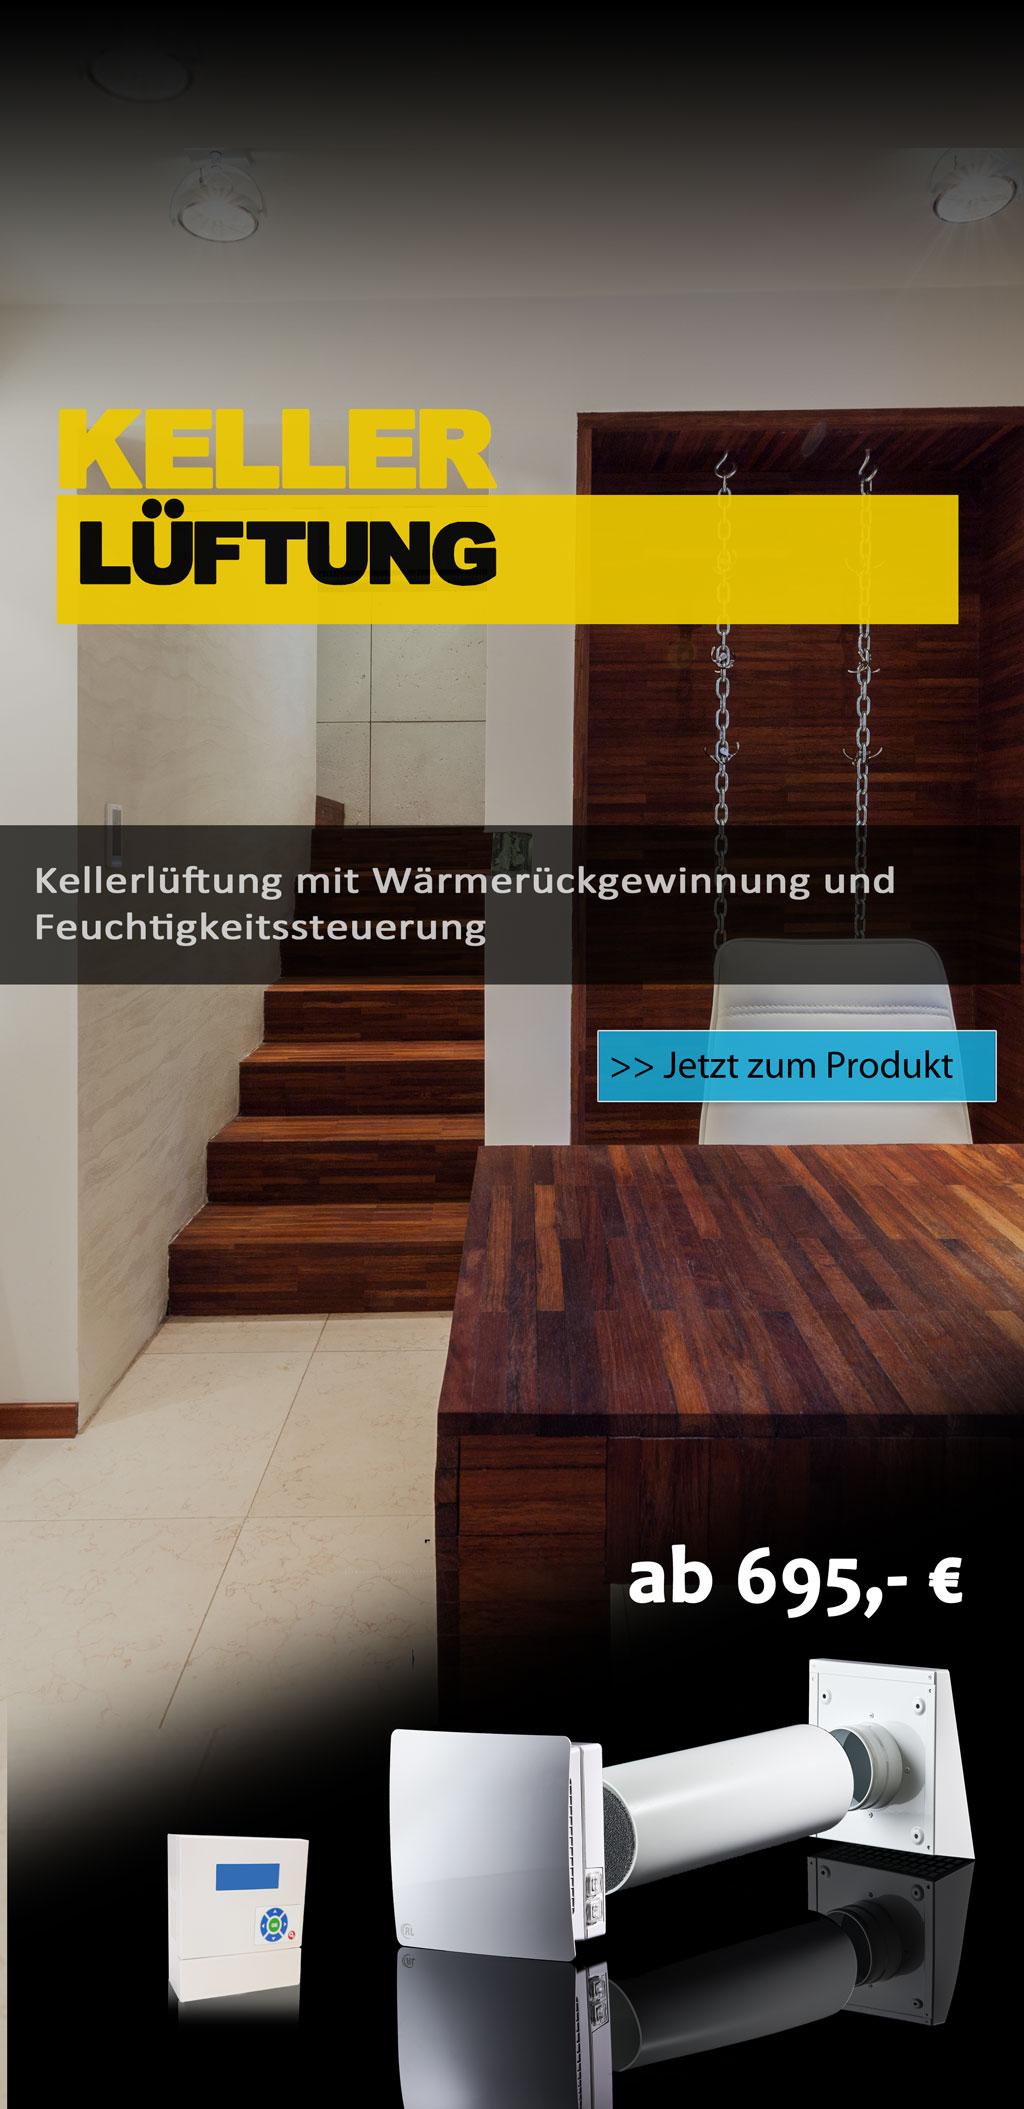 Kellerbel_ftung-hochkant-neu_2